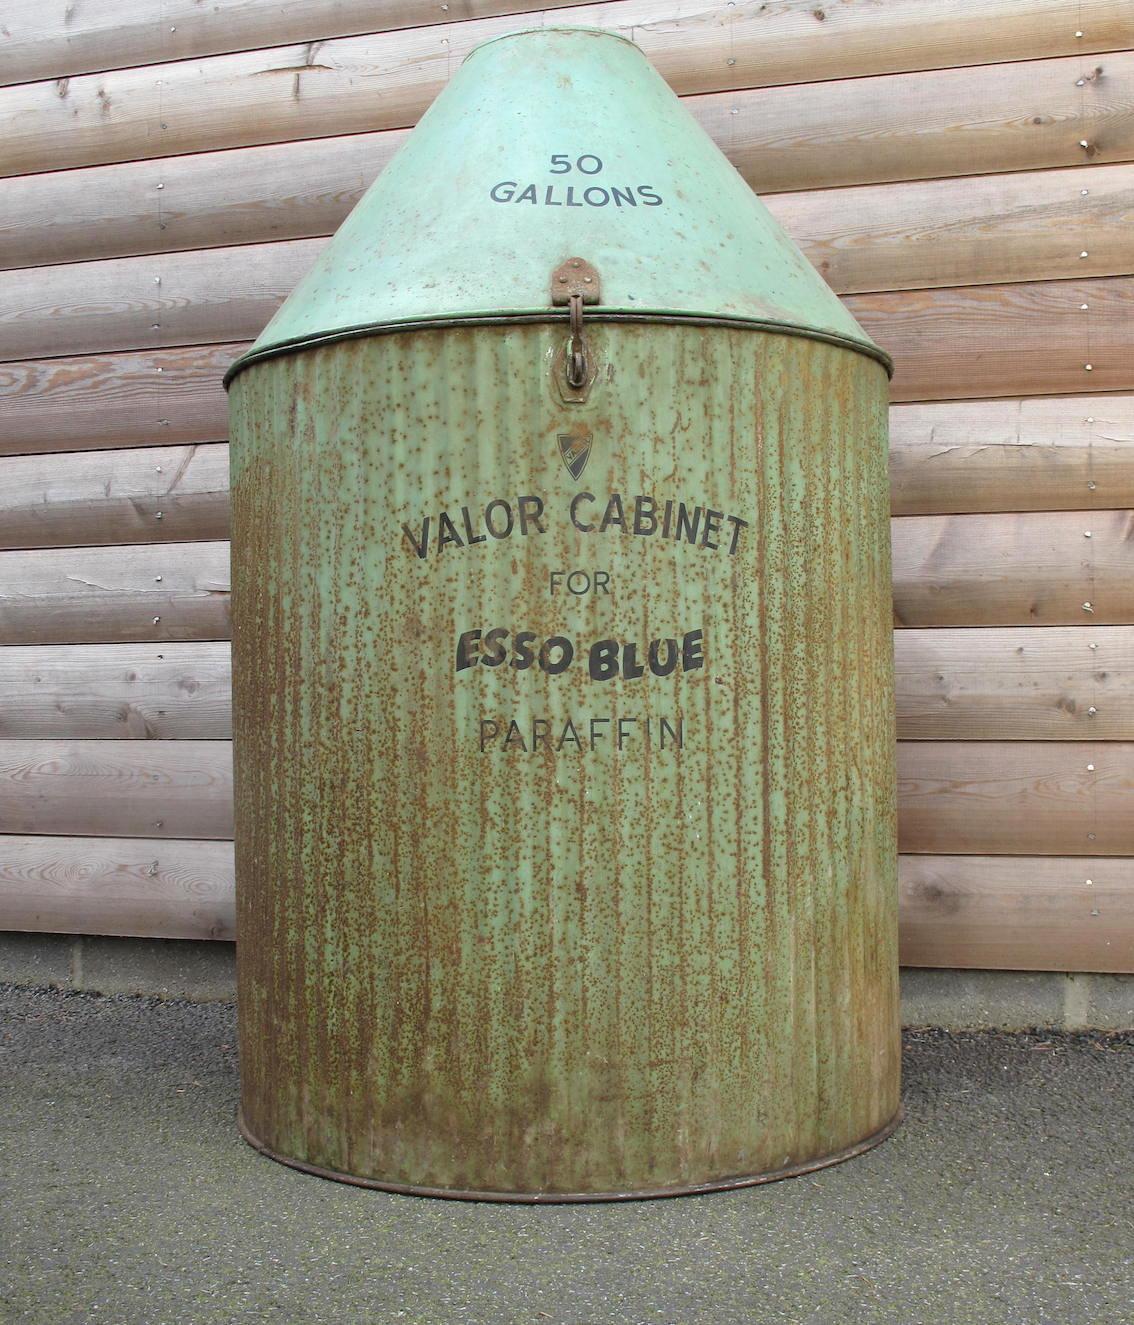 Esso Blue Paraffin Valor Cabinet For Sale (picture 1 of 6)